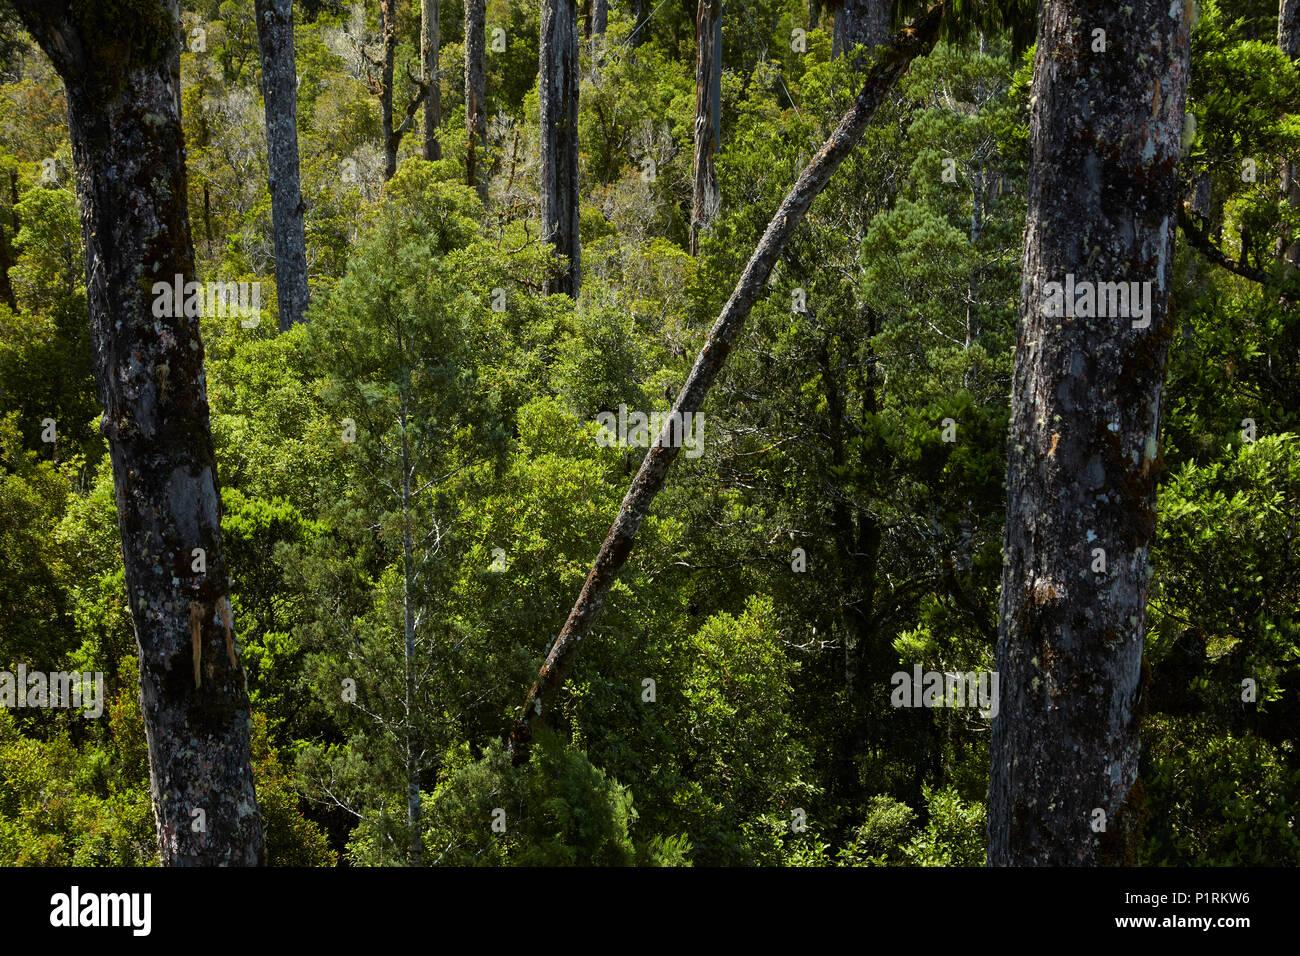 Native forest seen from Treetop Walkway, near Hokitika, West Coast, South Island, New Zealand - Stock Image